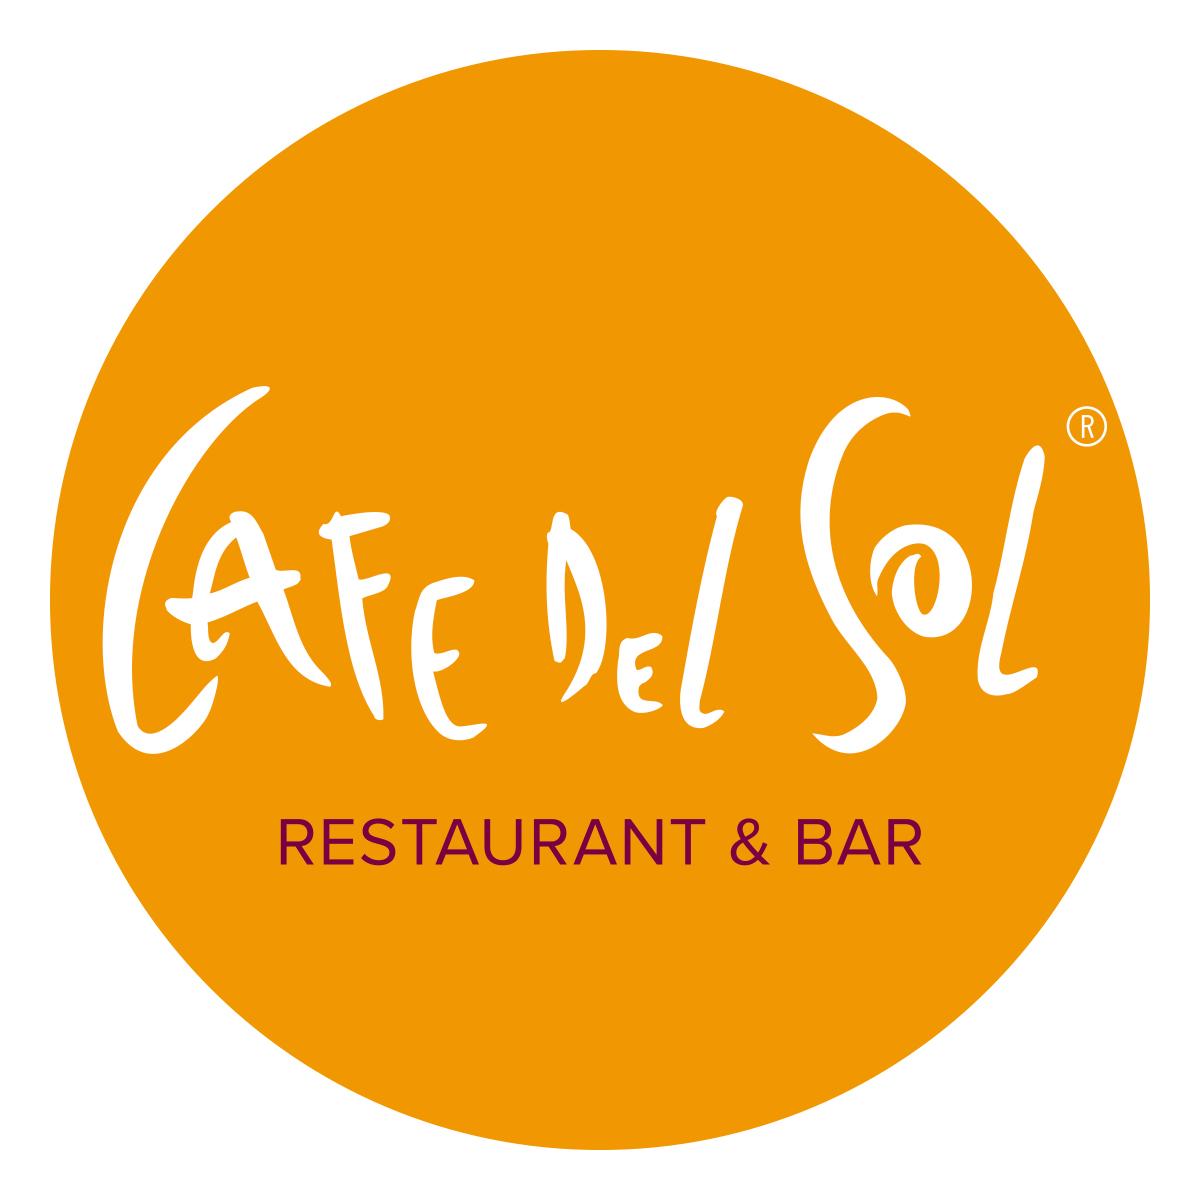 cafe del sol castrop rauxel restaurants castrop rauxel deutschland tel 02305354. Black Bedroom Furniture Sets. Home Design Ideas